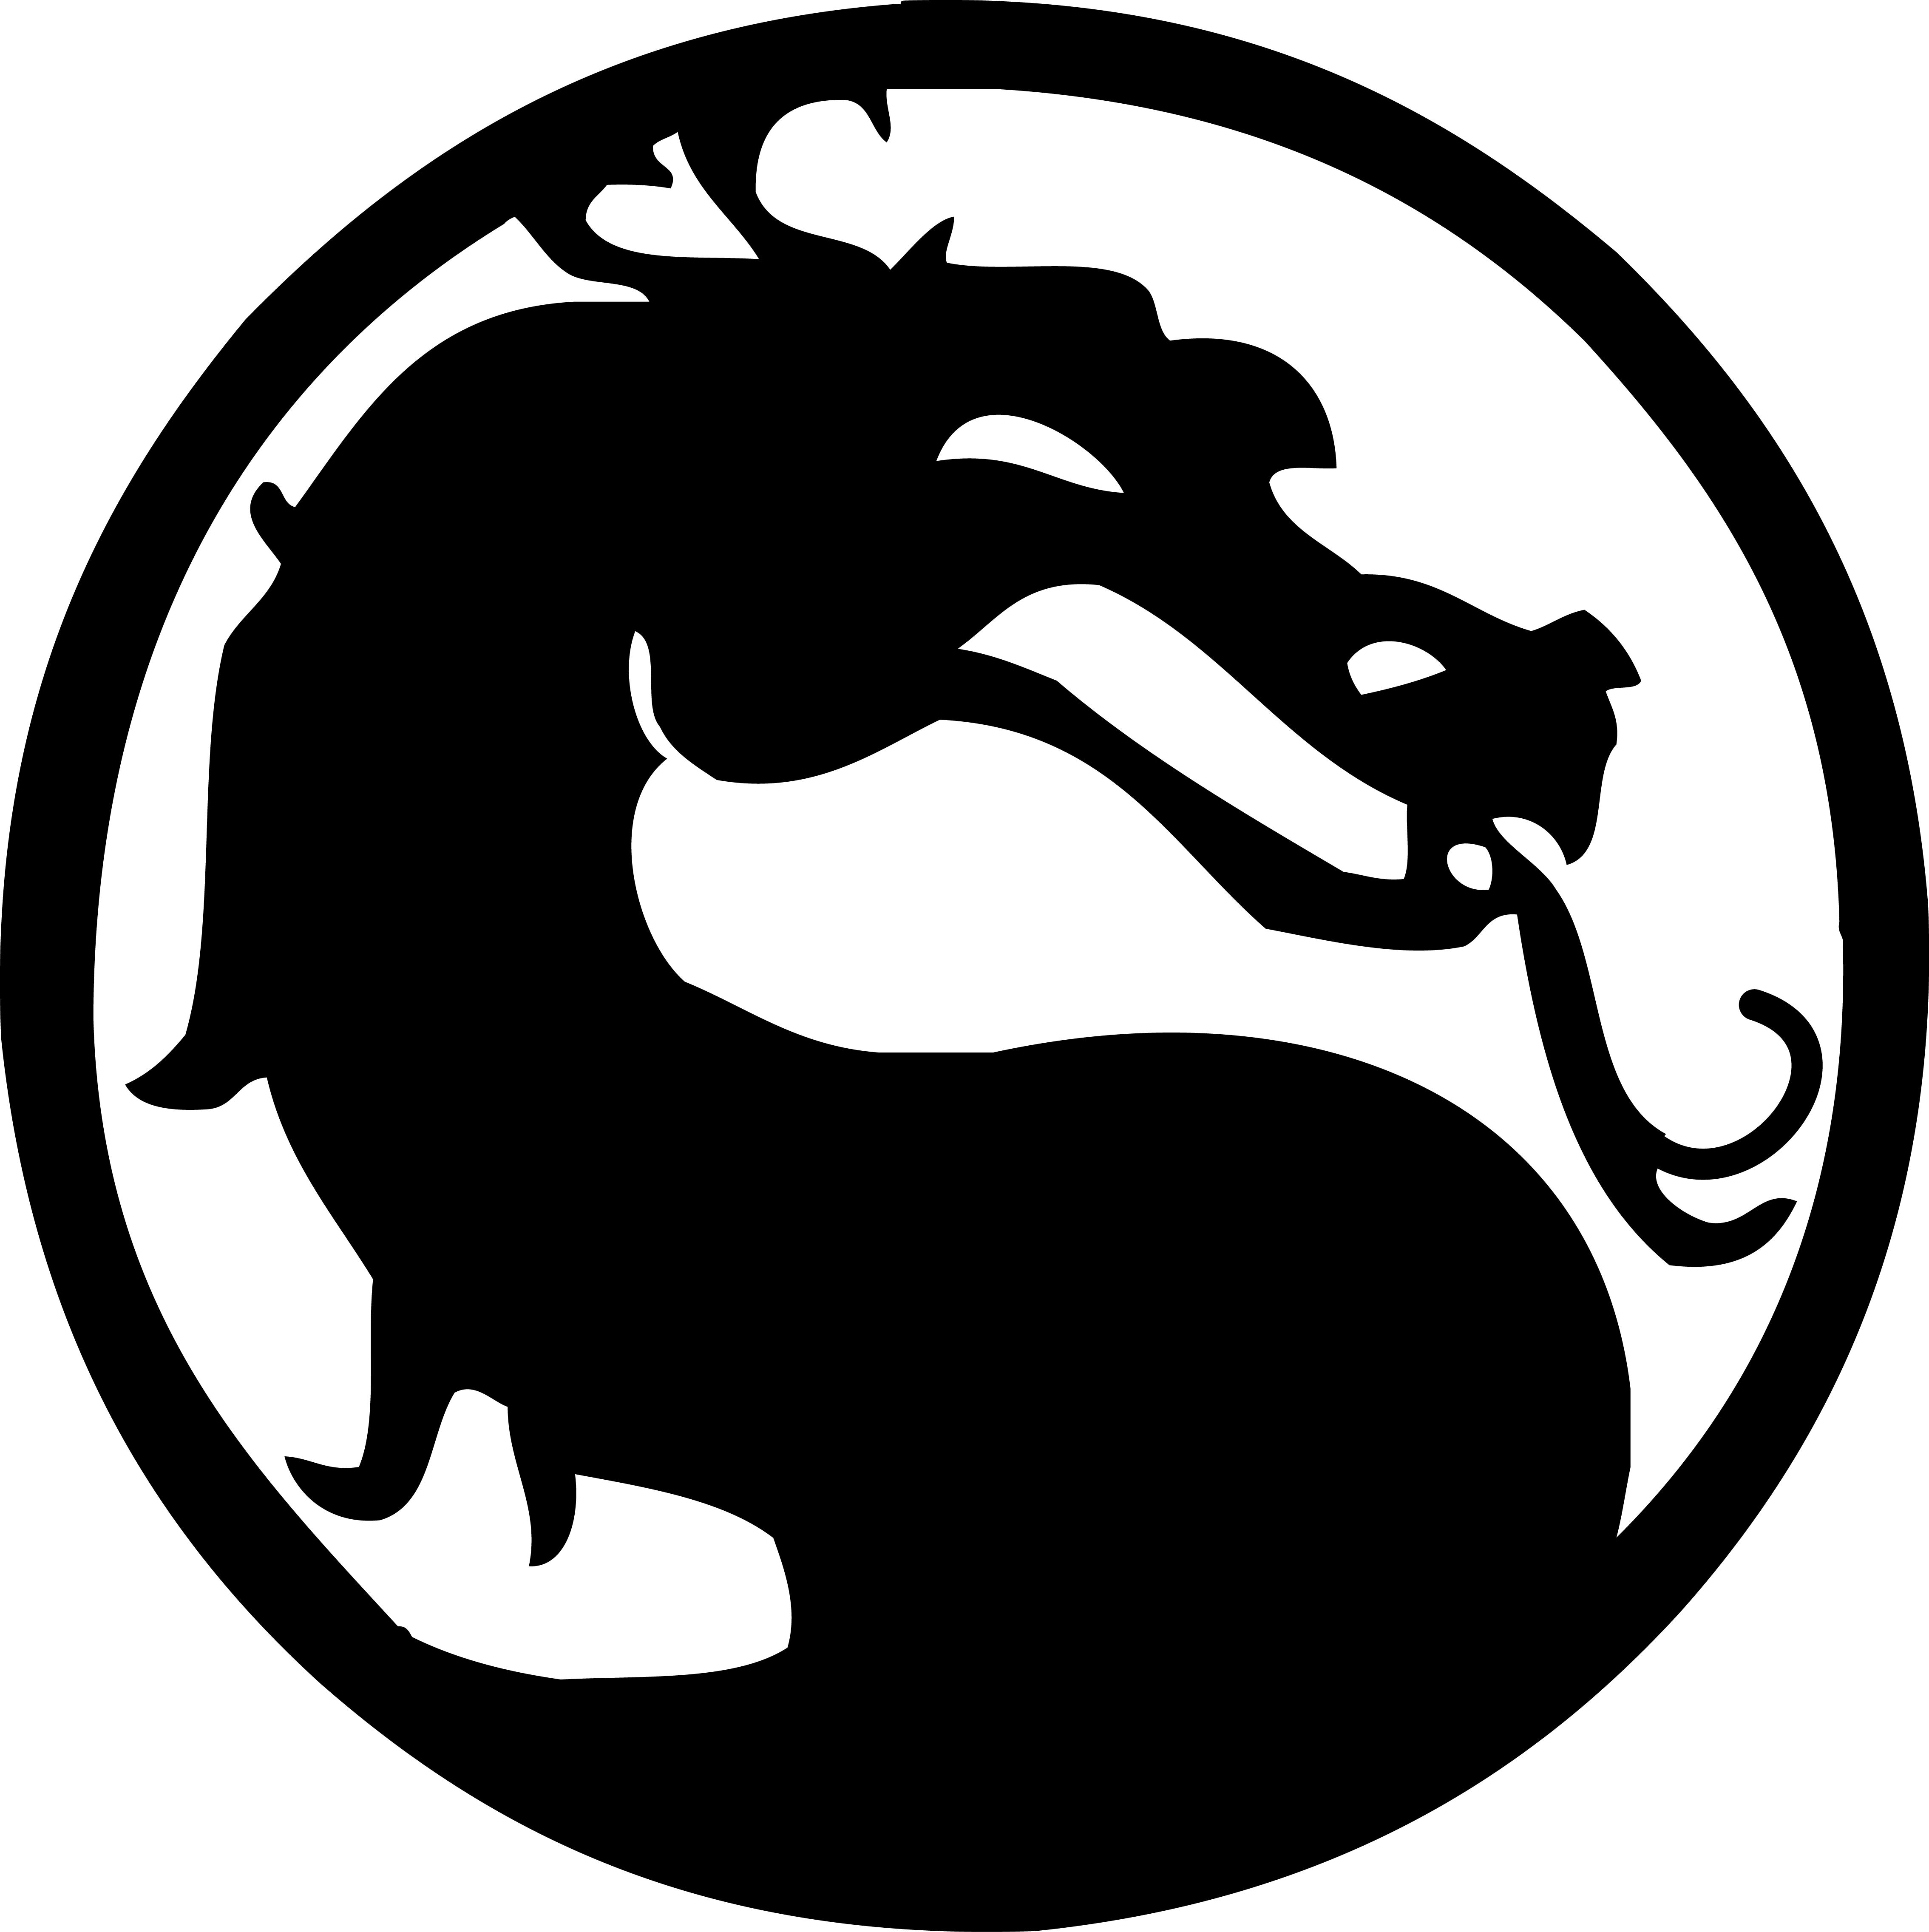 Mortal Kombat logo vector by reptiletc 4538x4545